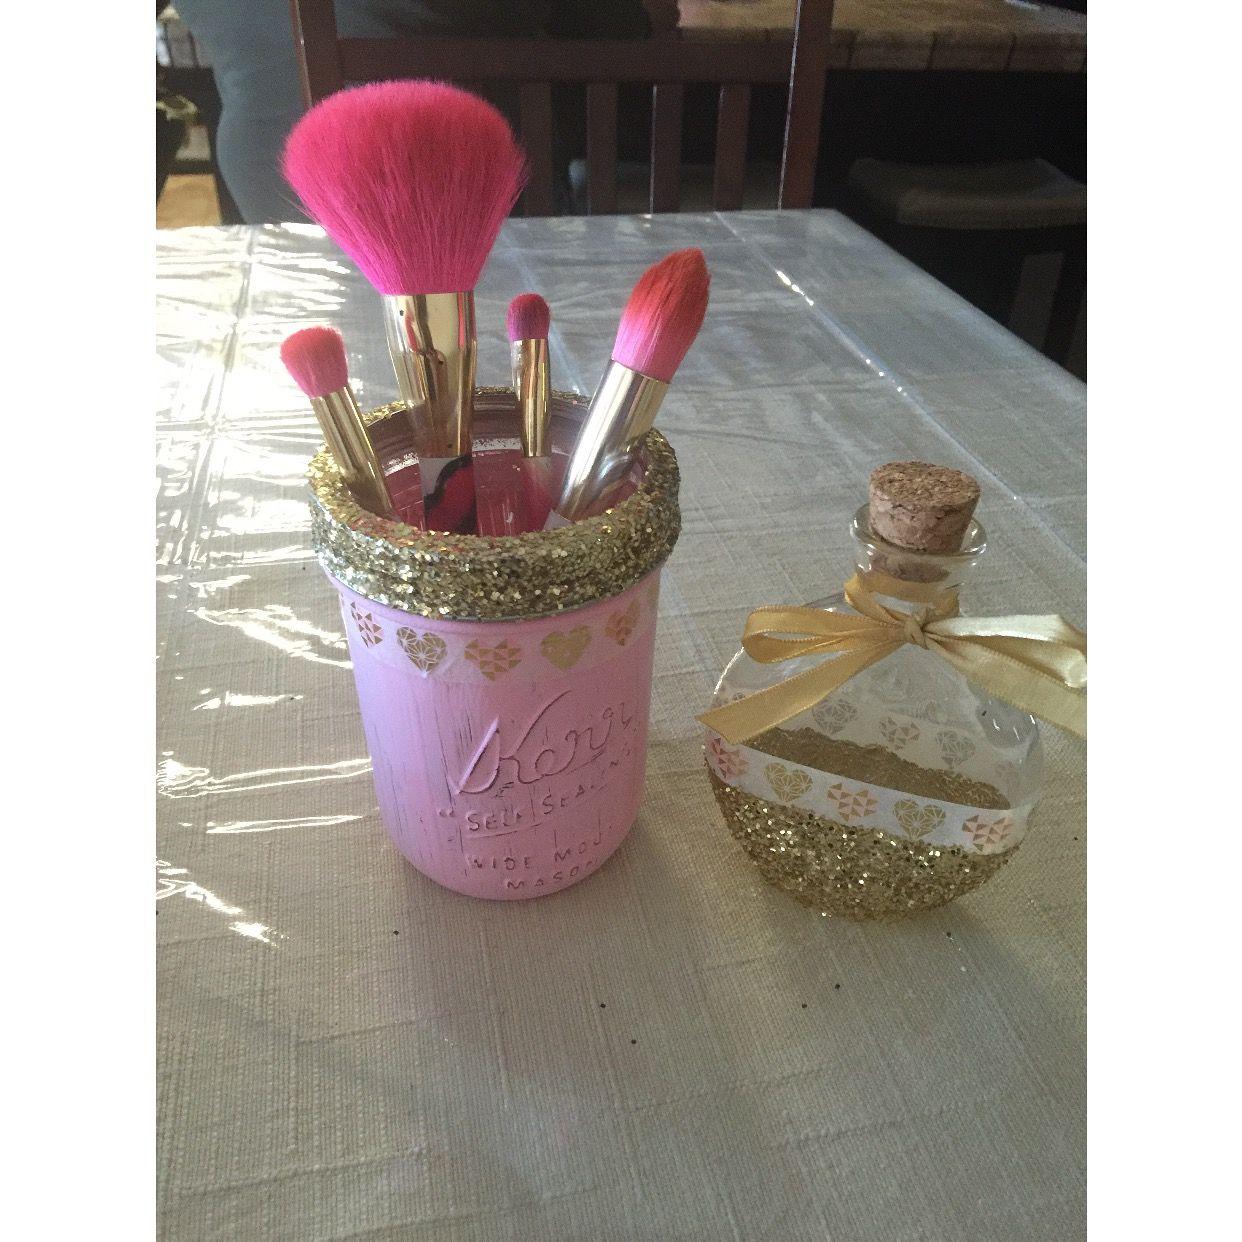 Mason jar brush holder and nail polish remover jar